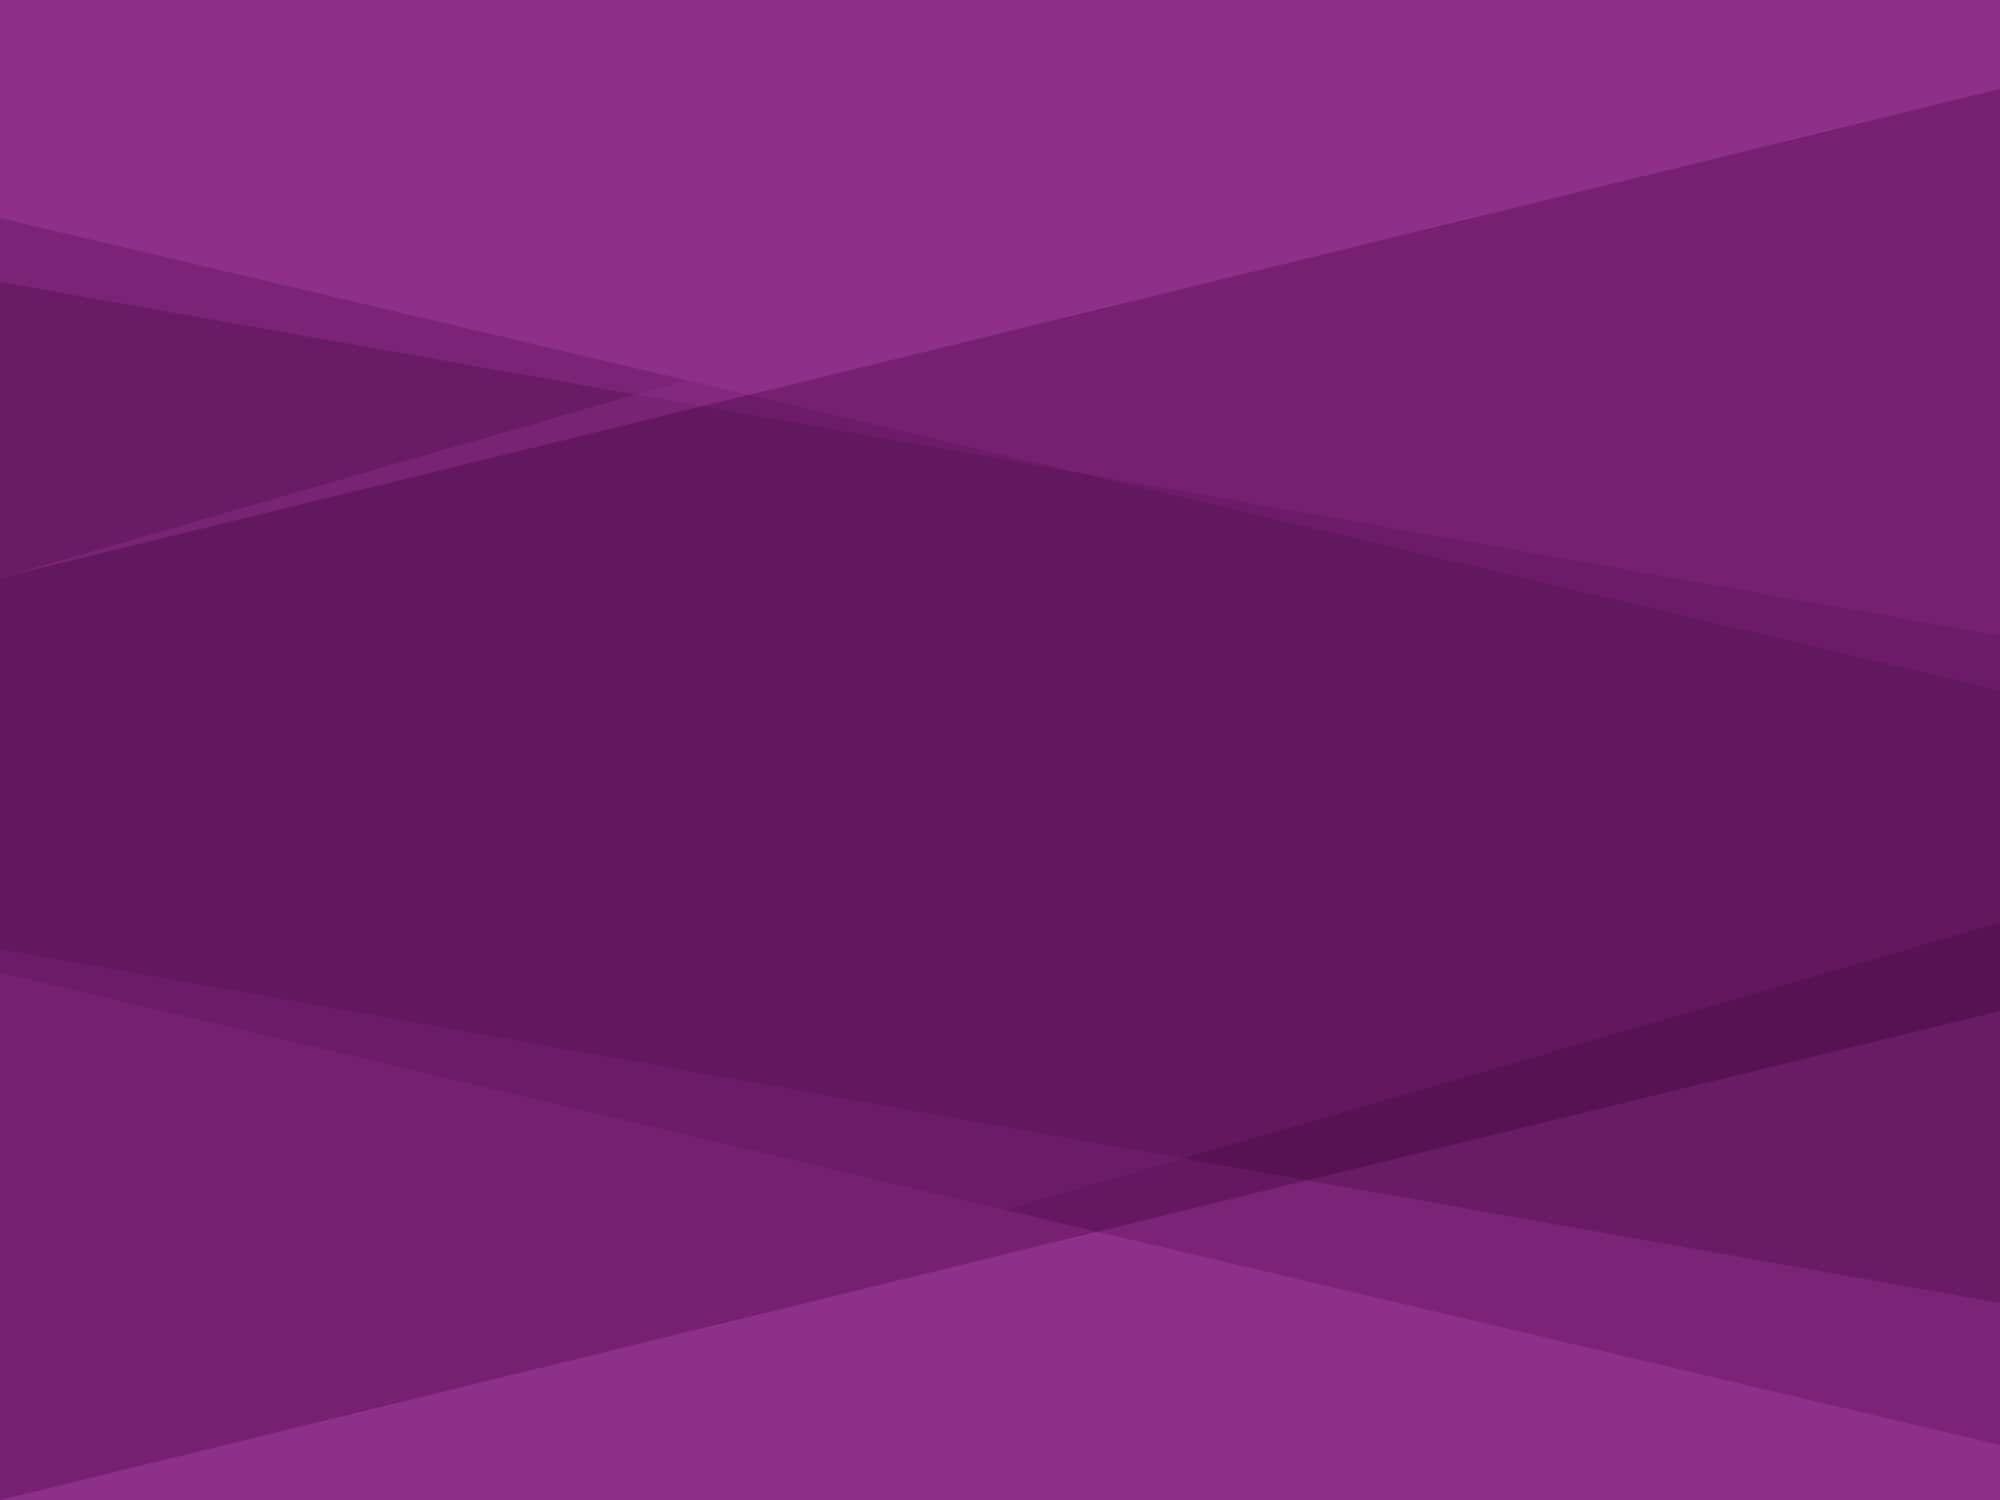 Diagonal screens texture plum